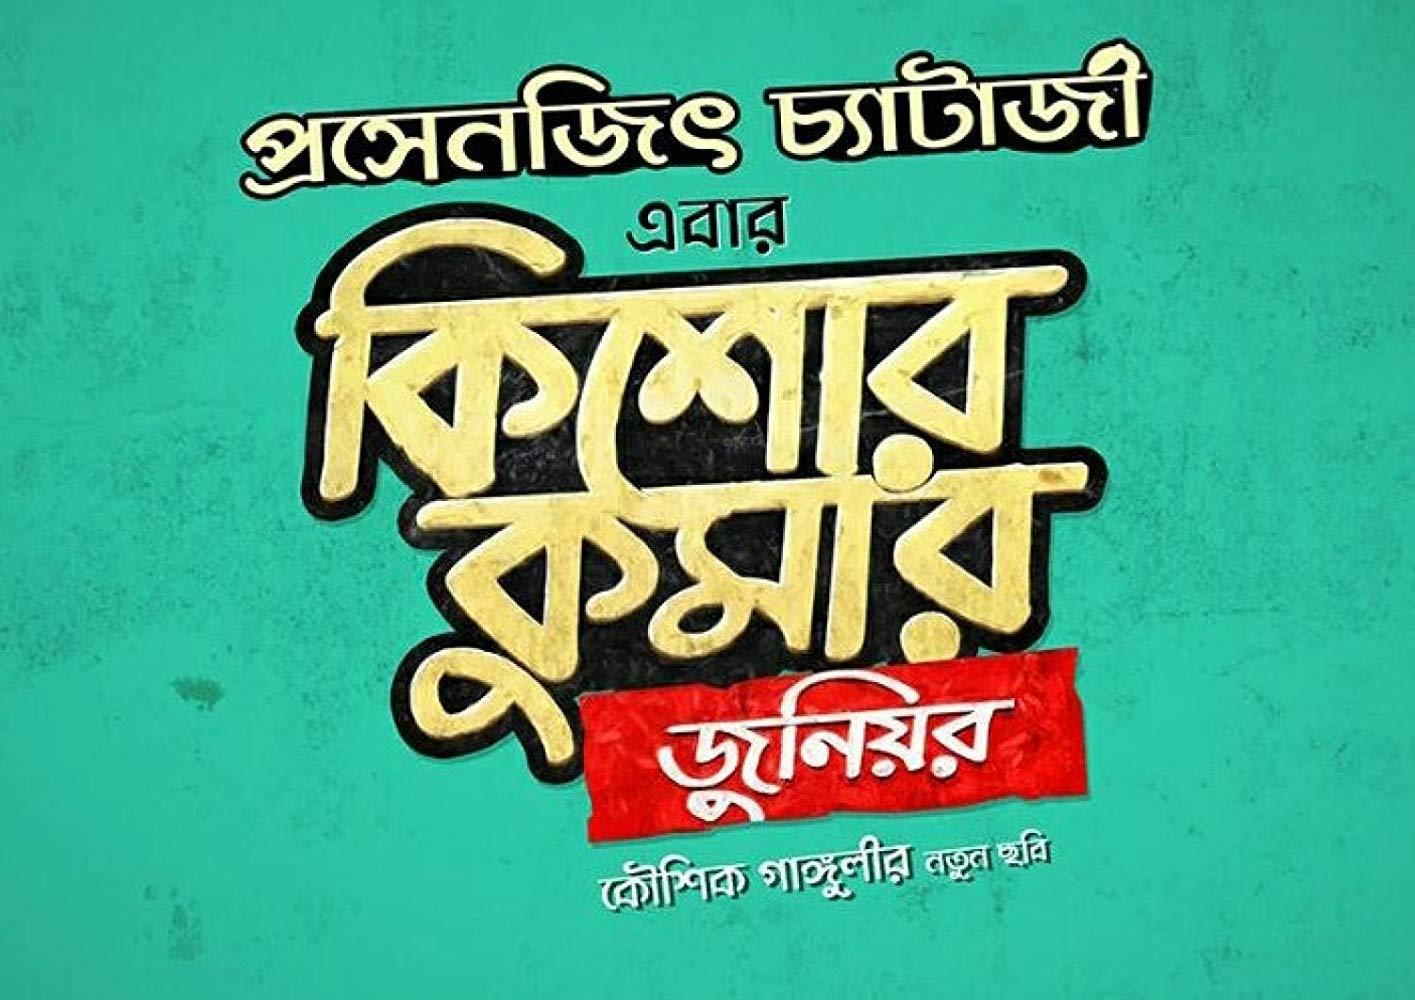 Kishore Kumar Junior 2018 Bengali WEB-DL HDRip x264 AAC [Team DRSD]